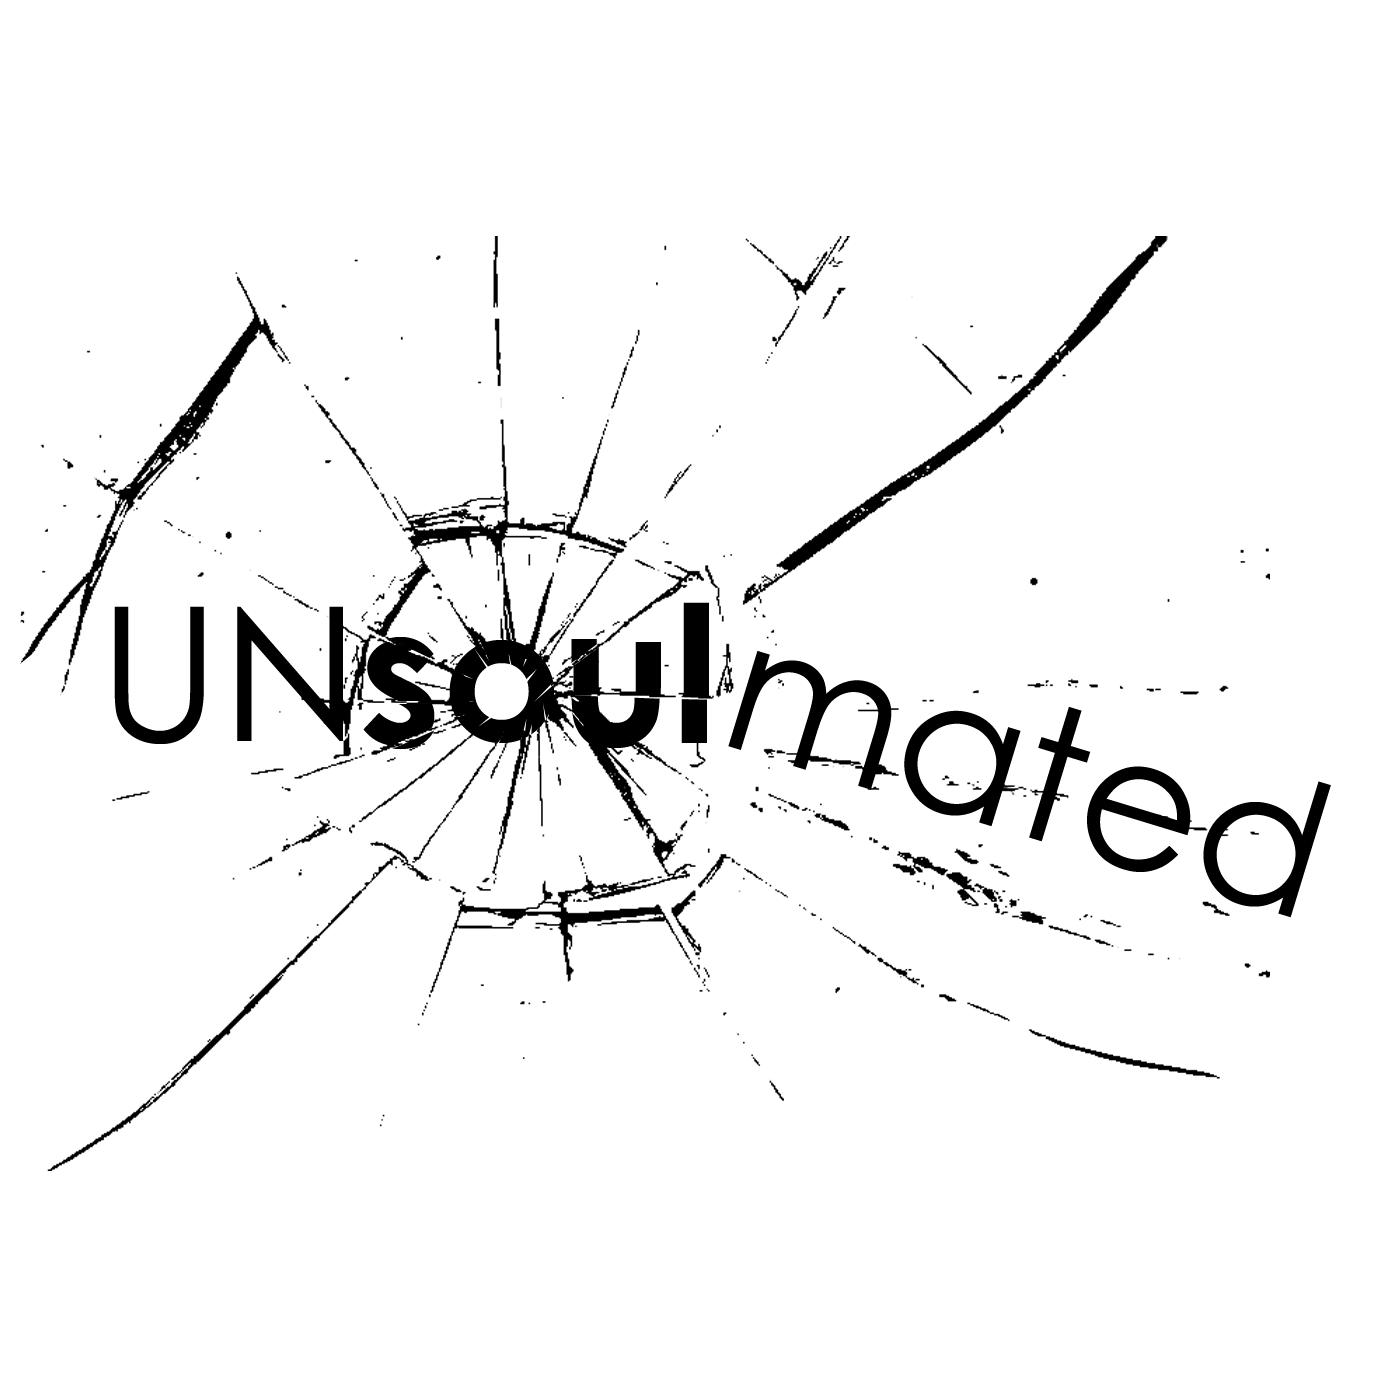 unsoulmated.com